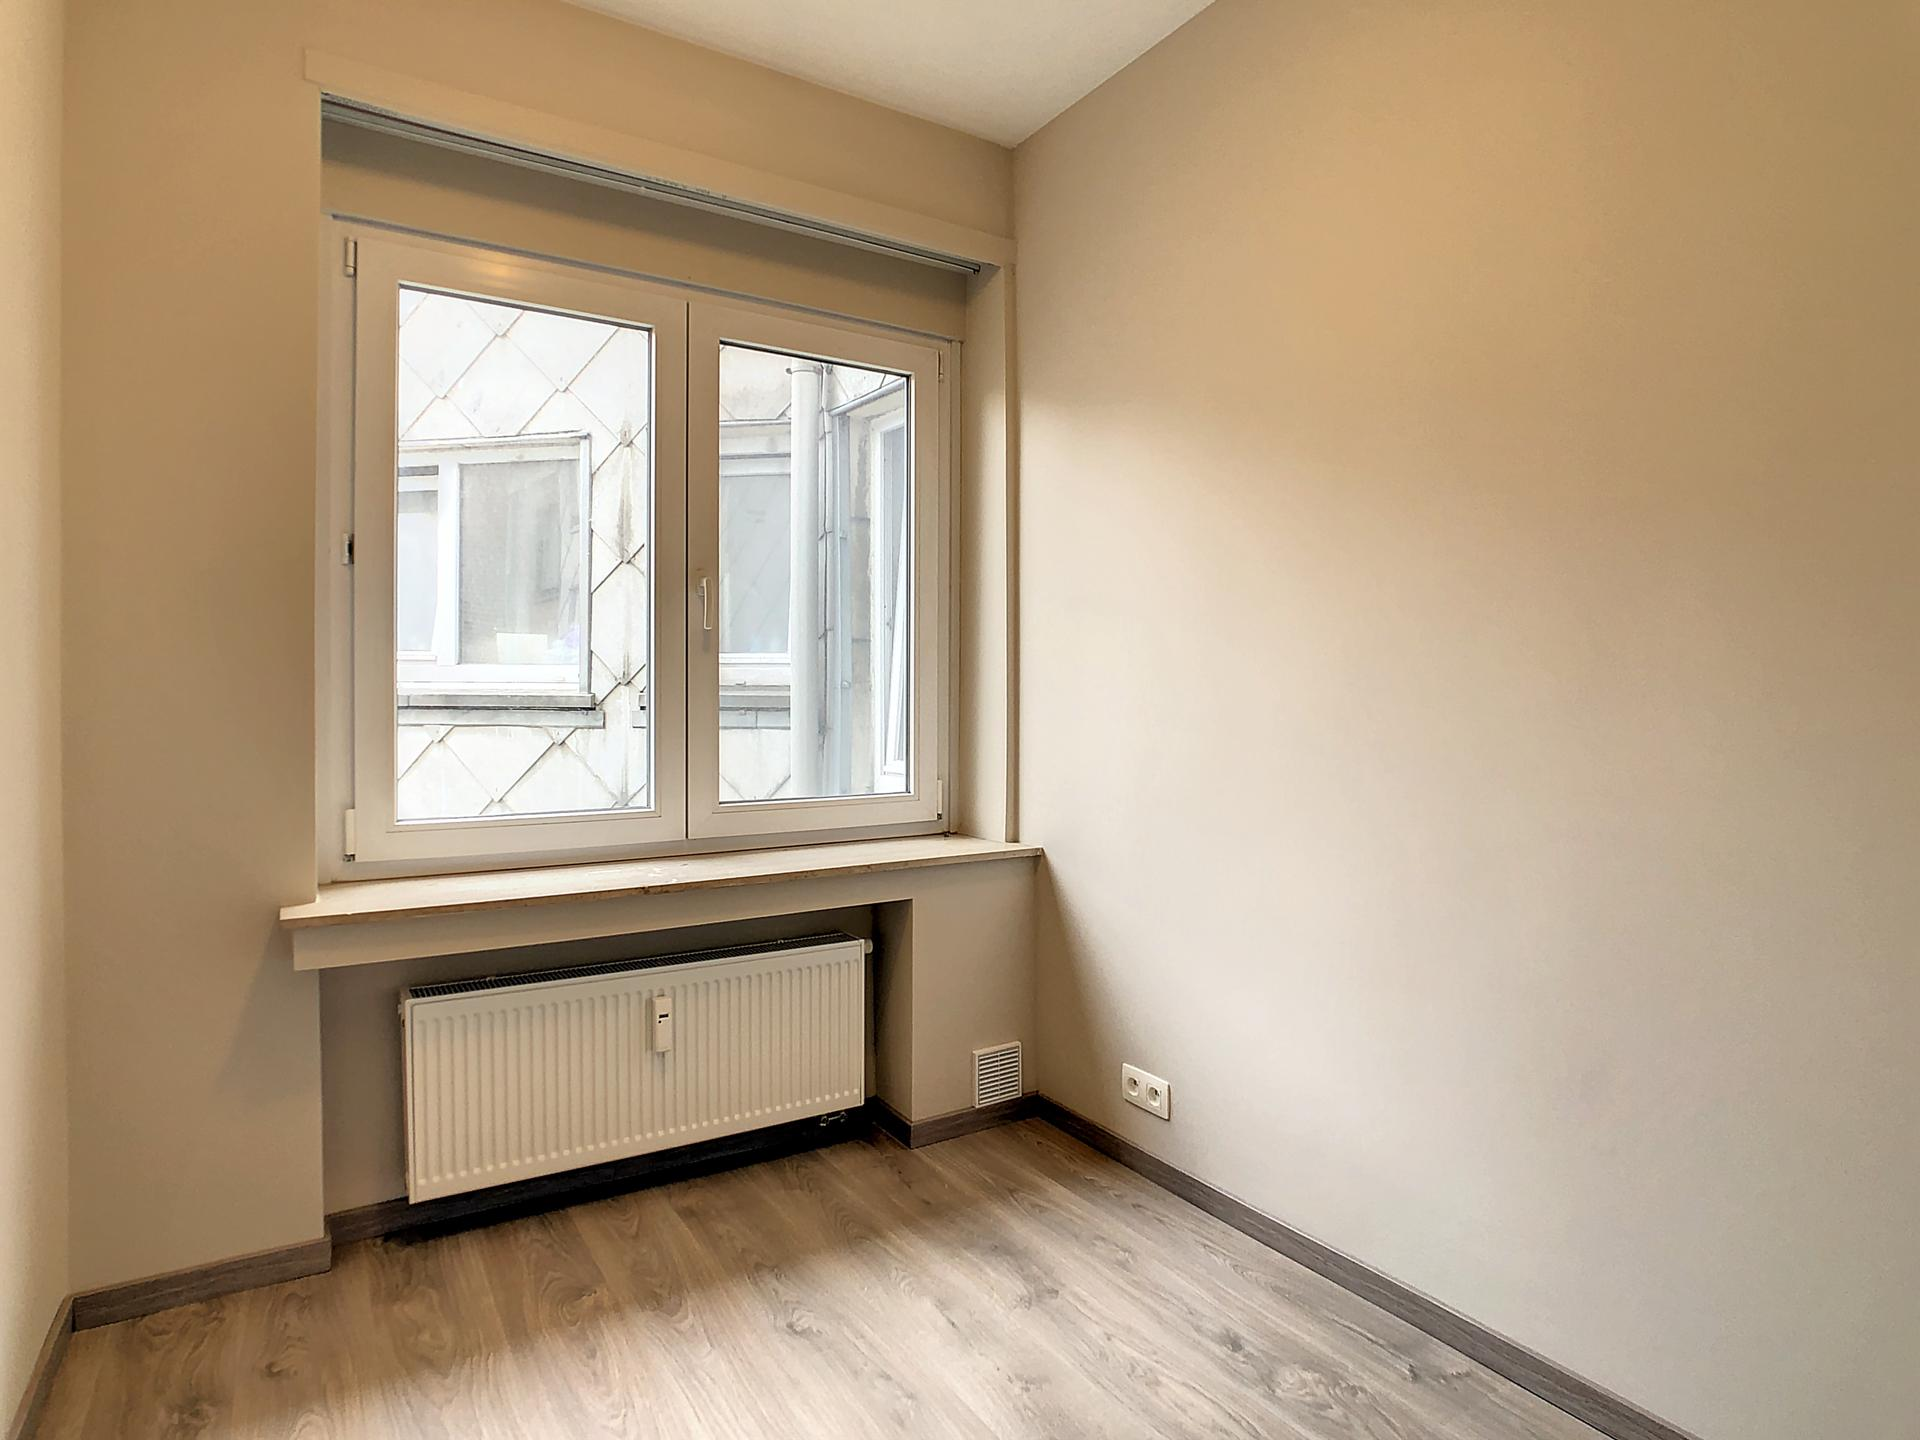 Appartement - Anderlecht - #4519665-4